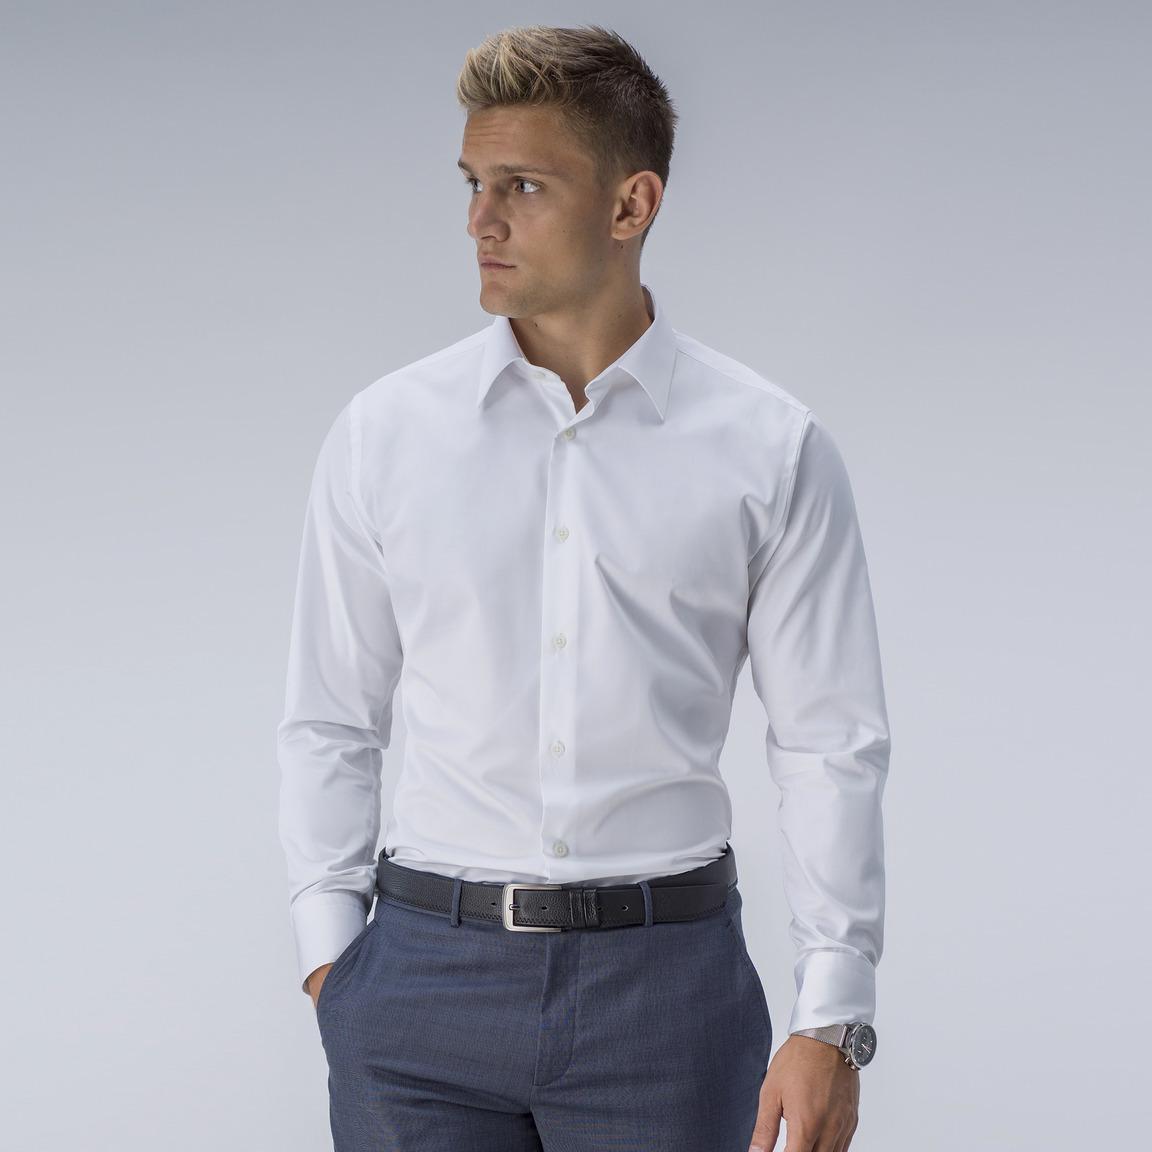 Weißes Business-Hemd